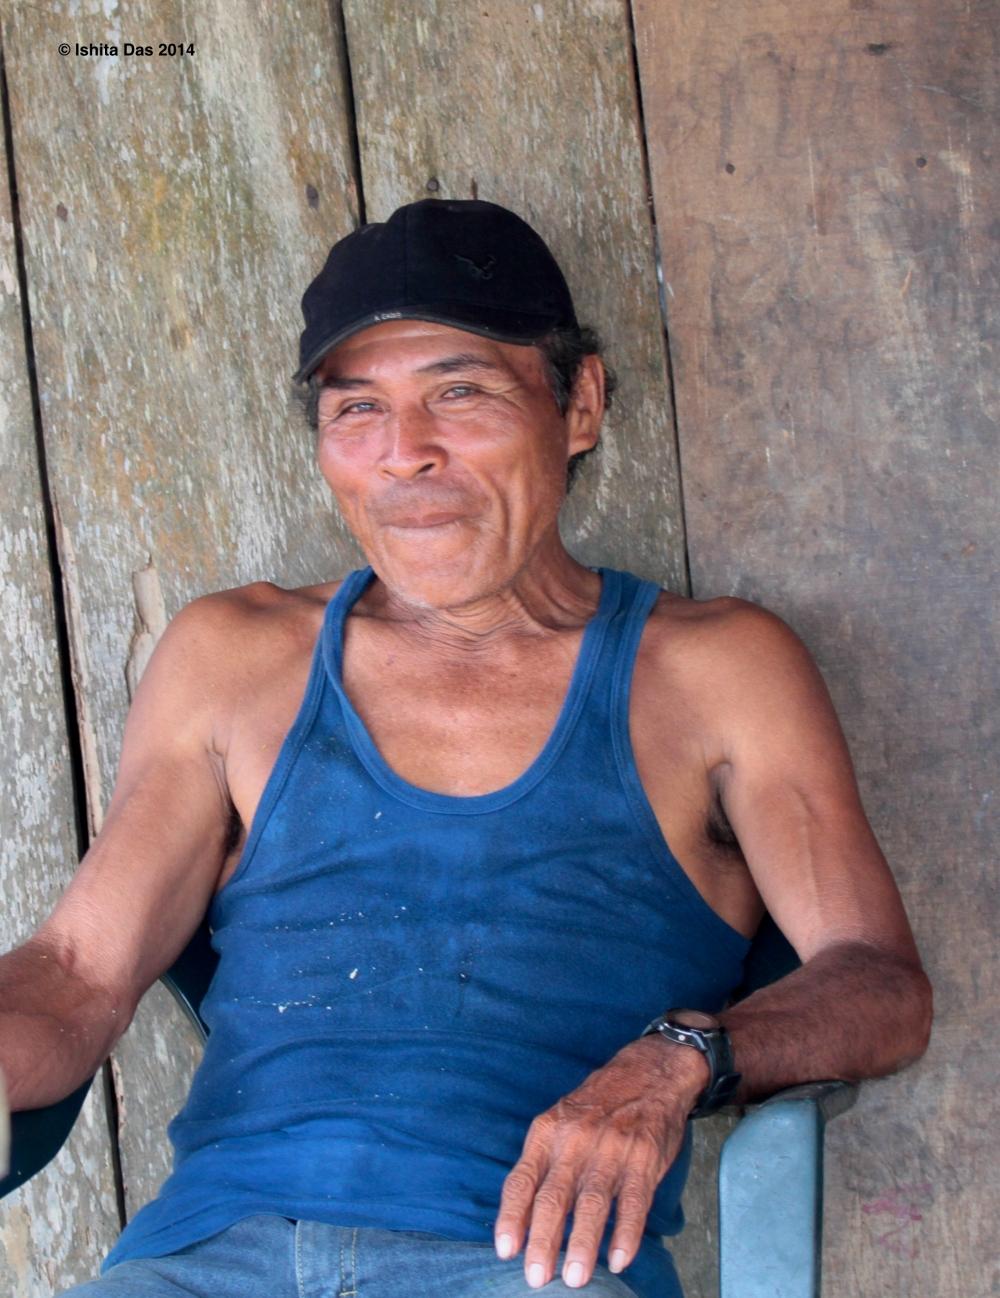 Amazon portrait 'man'-1